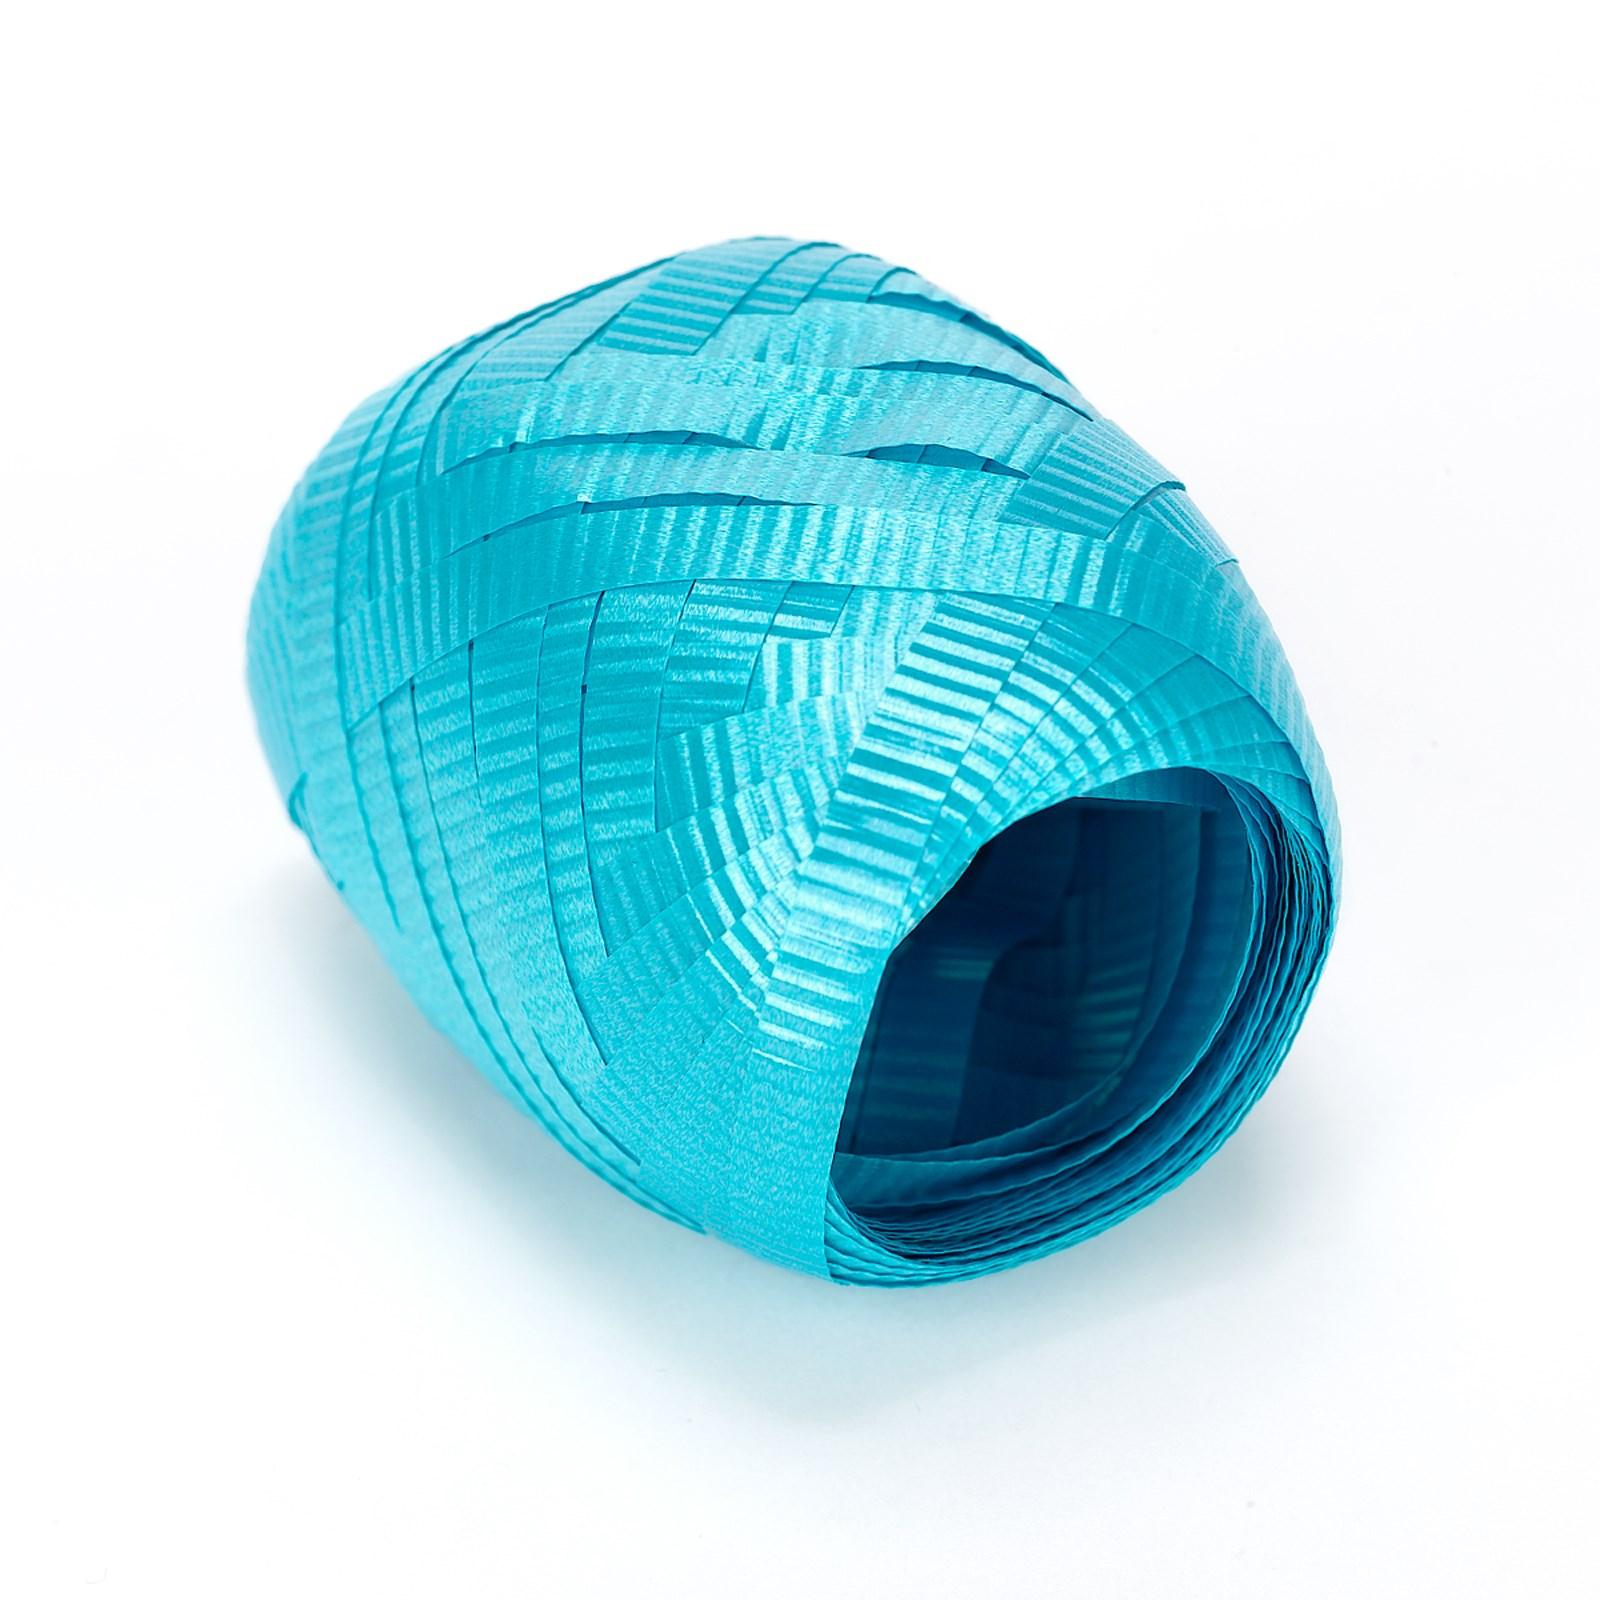 Image of Aqua Blue (Turquoise) Curling Ribbon - 50'